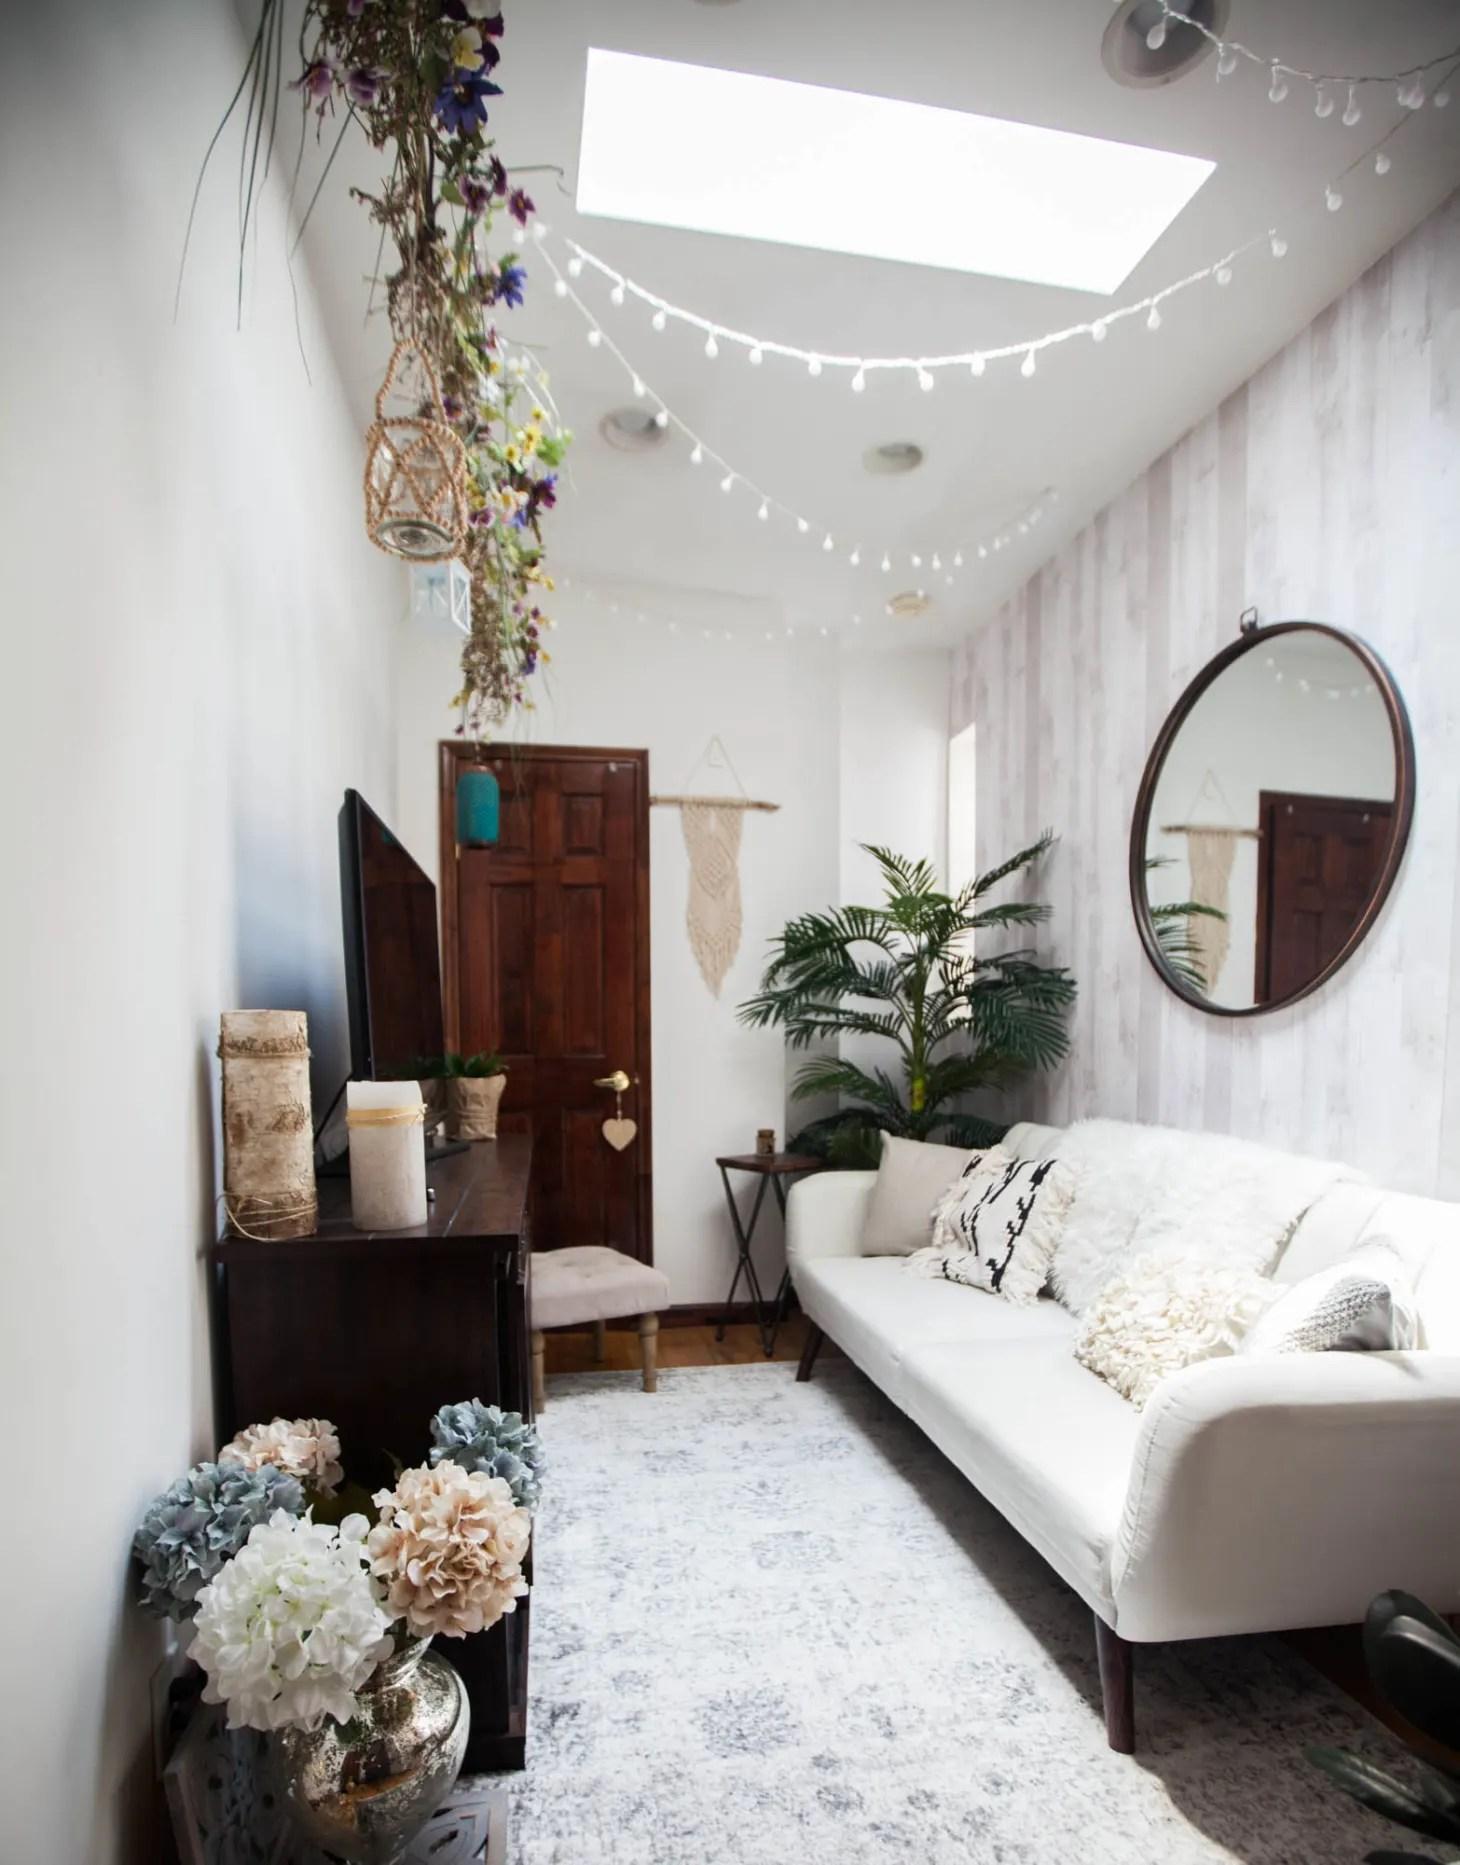 30 Small Living Room Decorating & Design Ideas - How to ... on Small Space Small Living Room Ideas  id=43482